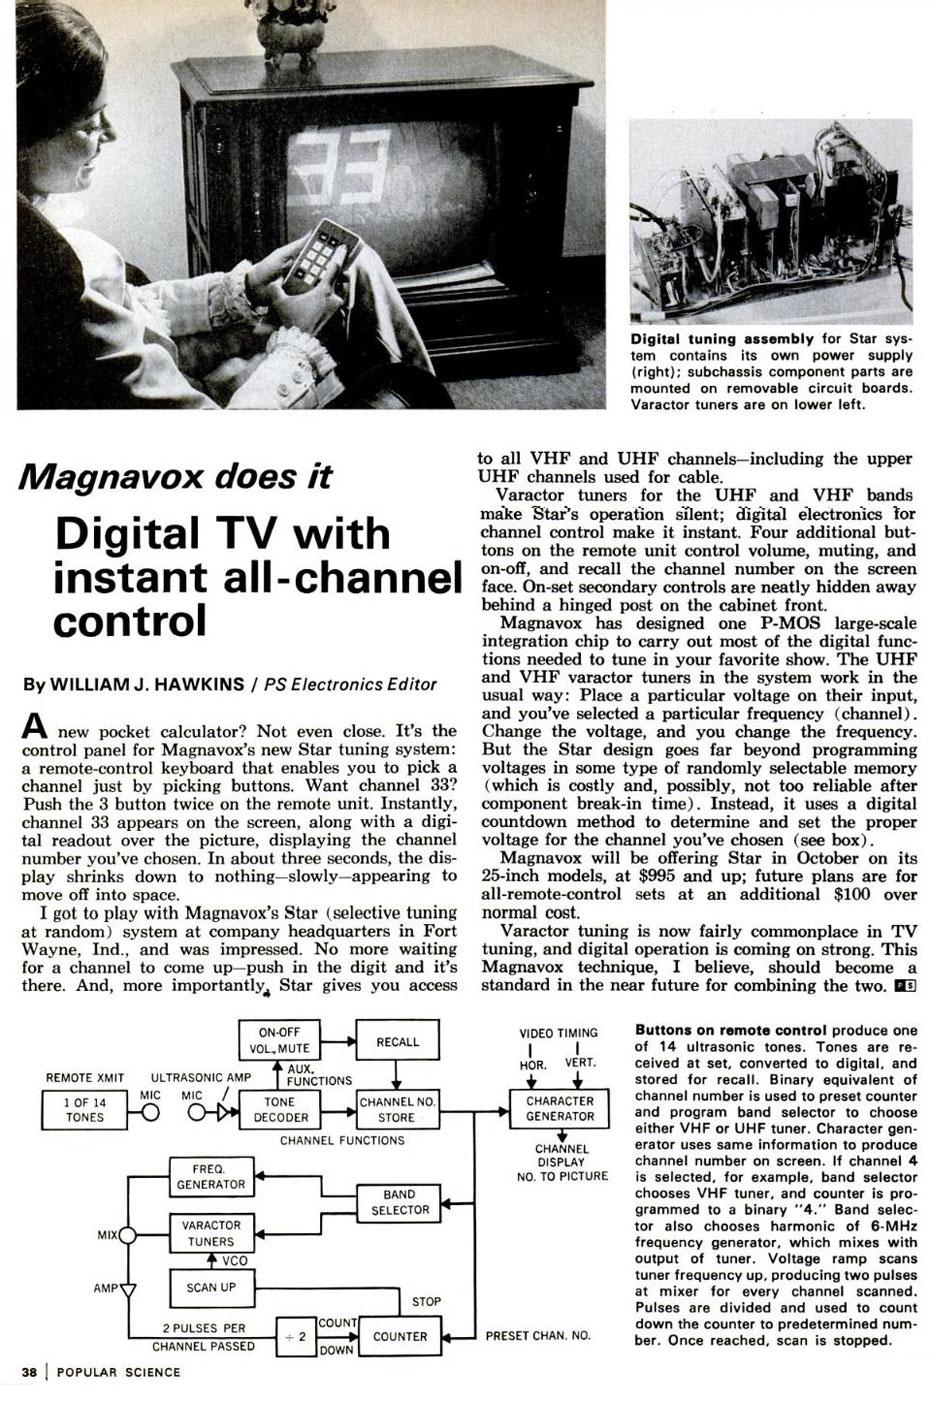 Early Digital Remote Control